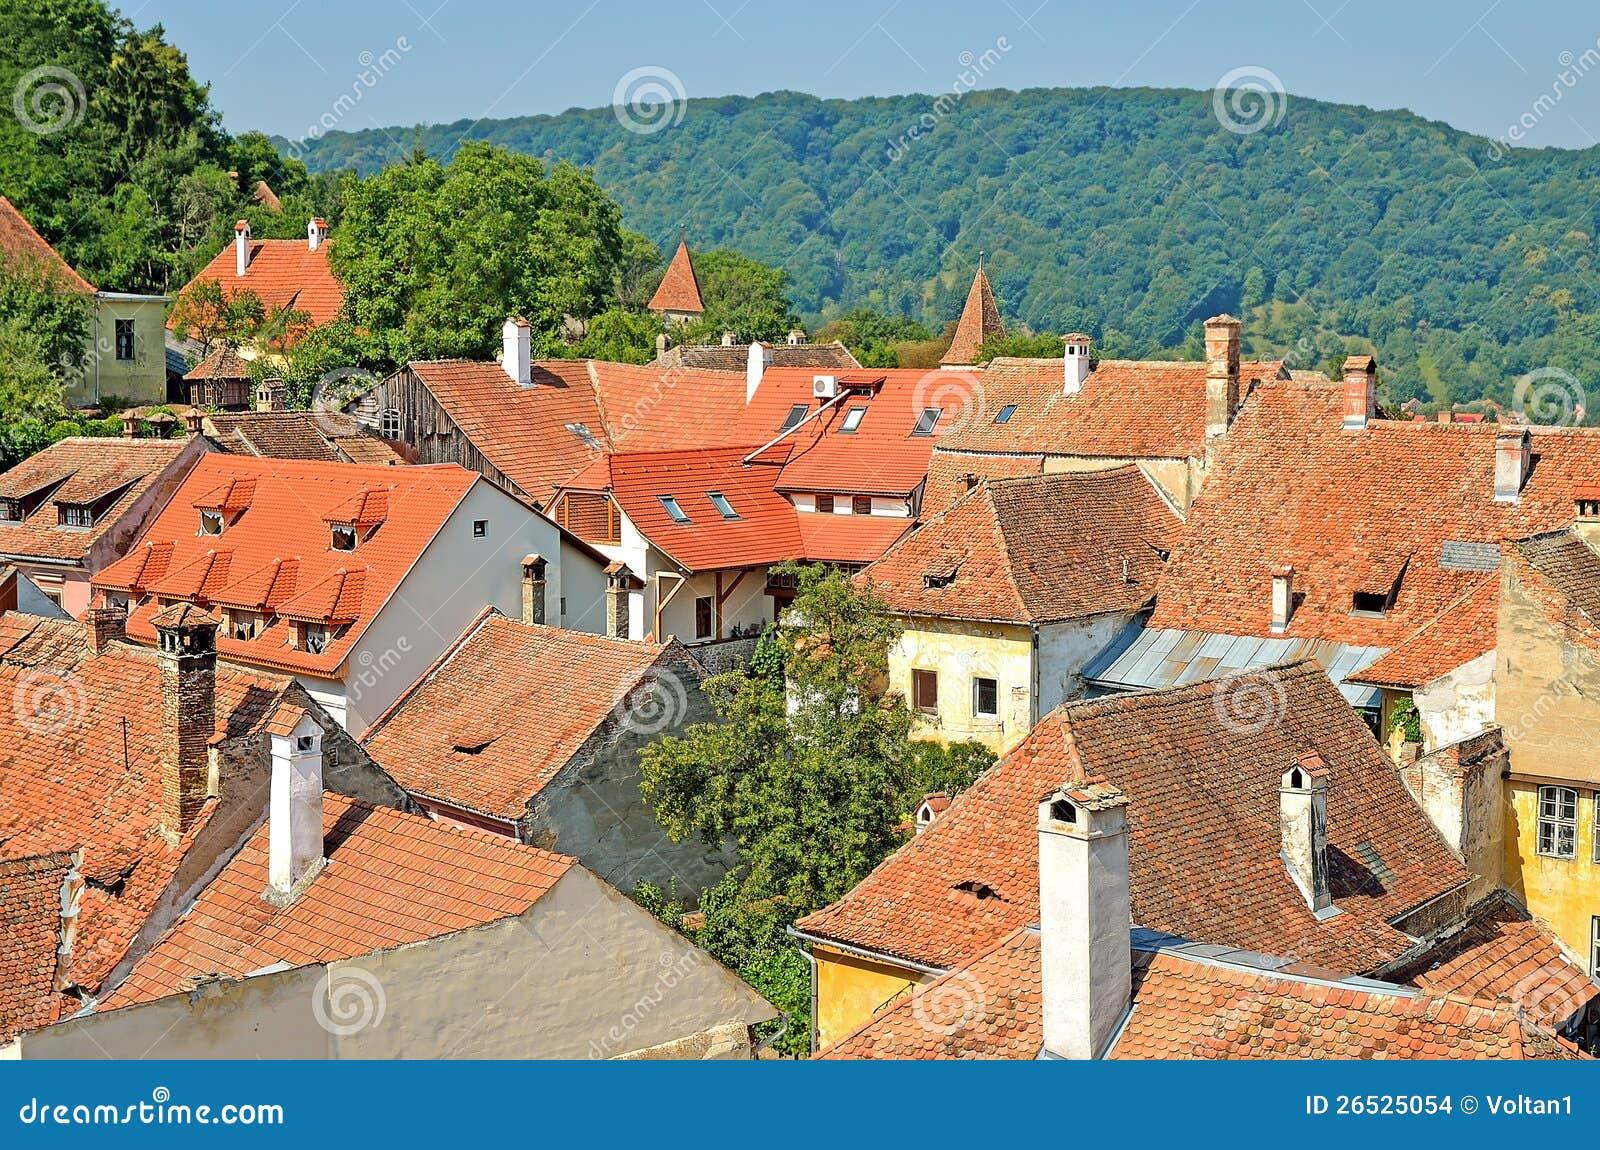 Sighisoara, Transylvania, Romania Stock Images - Image: 26525054